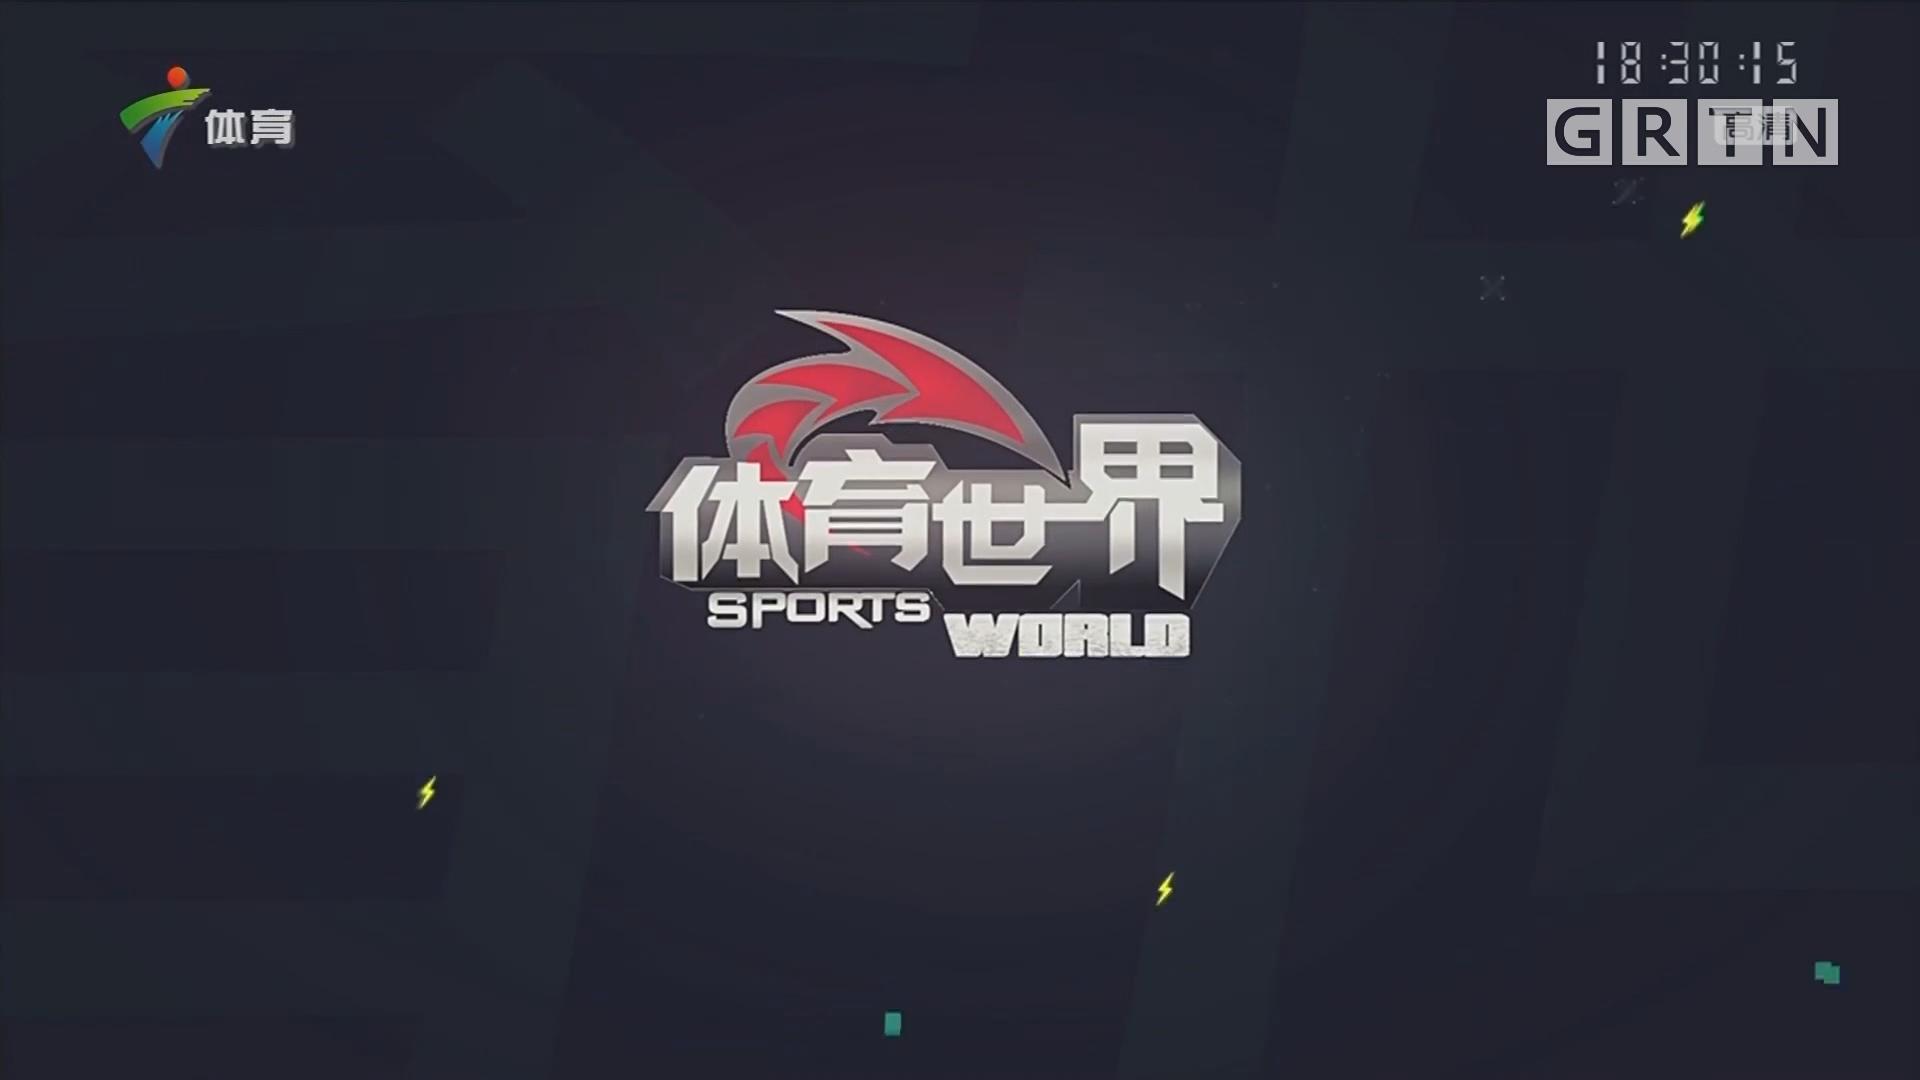 [HD][2018-12-04]体育世界:2018花城绿捡跑 美丽乡村传递环保理念